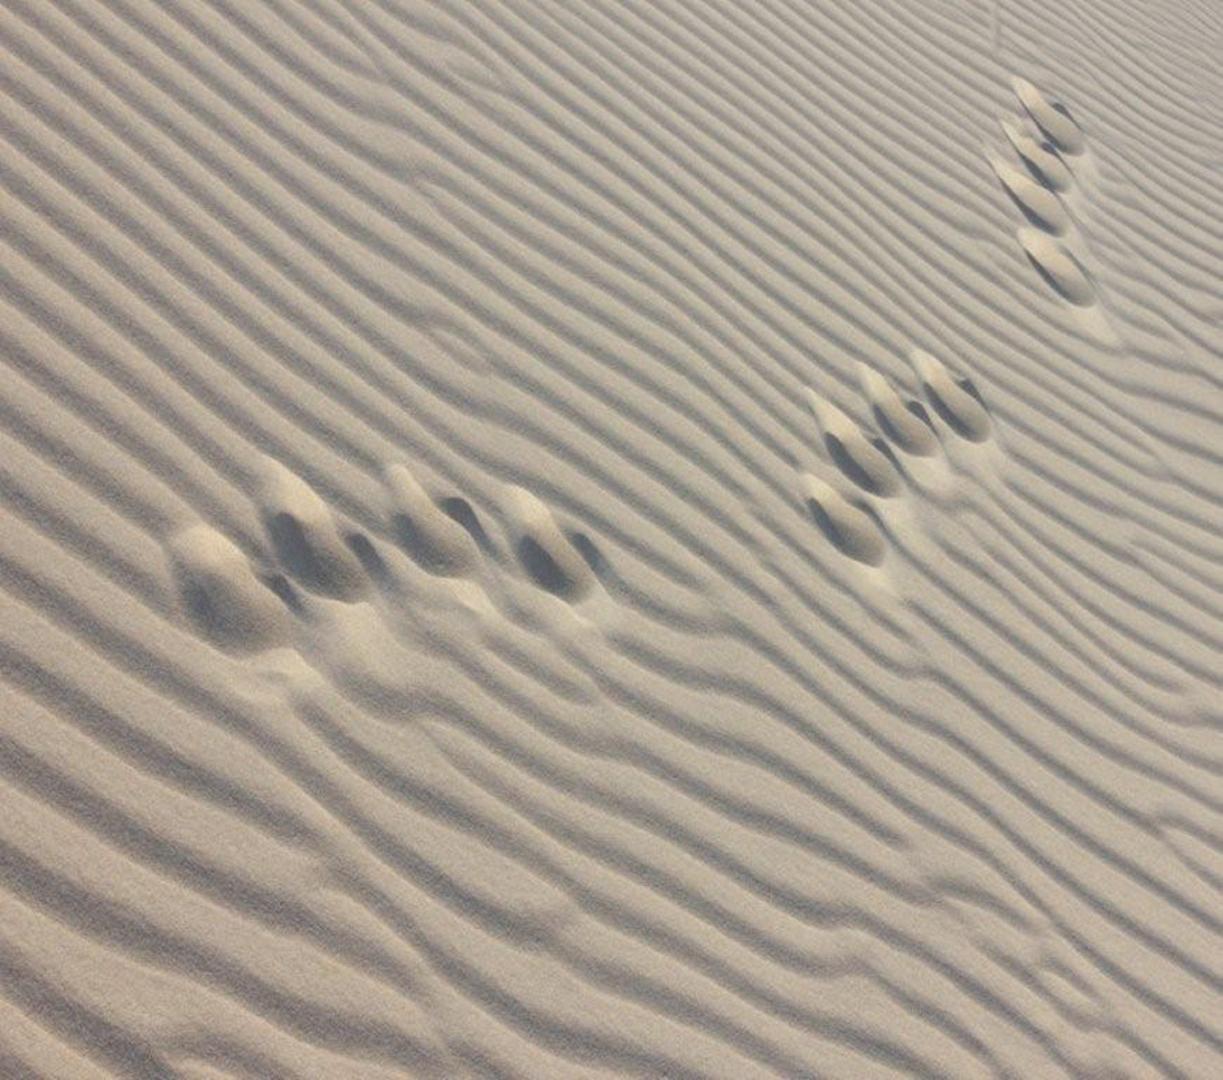 Footprints